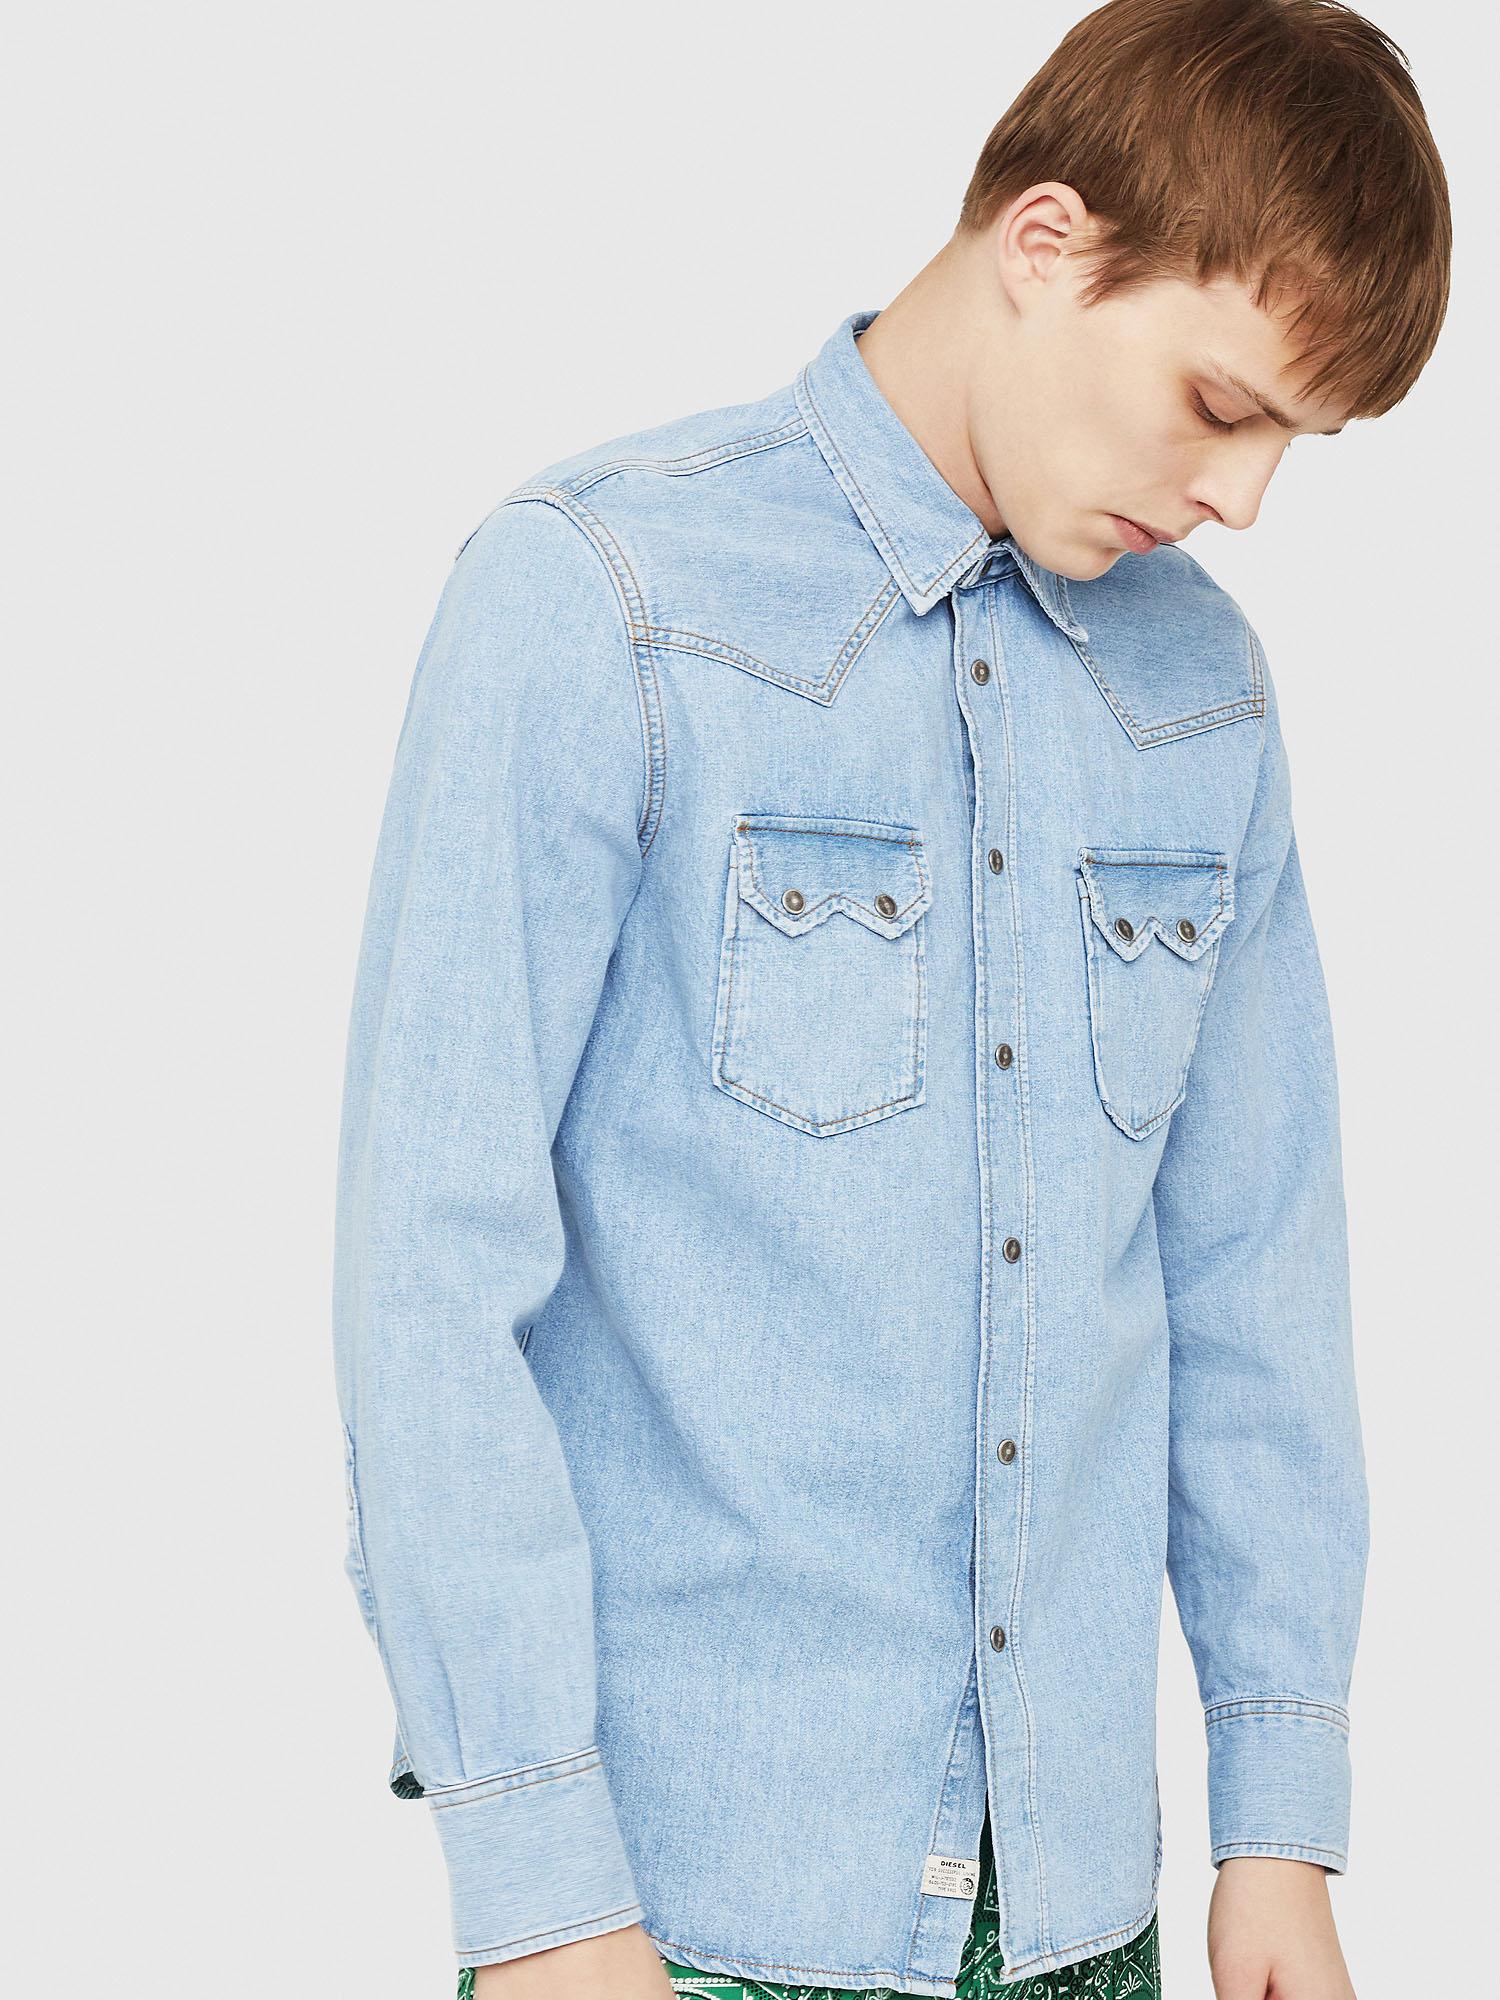 Diesel Denim Shirts 0DAVK - Blue - L